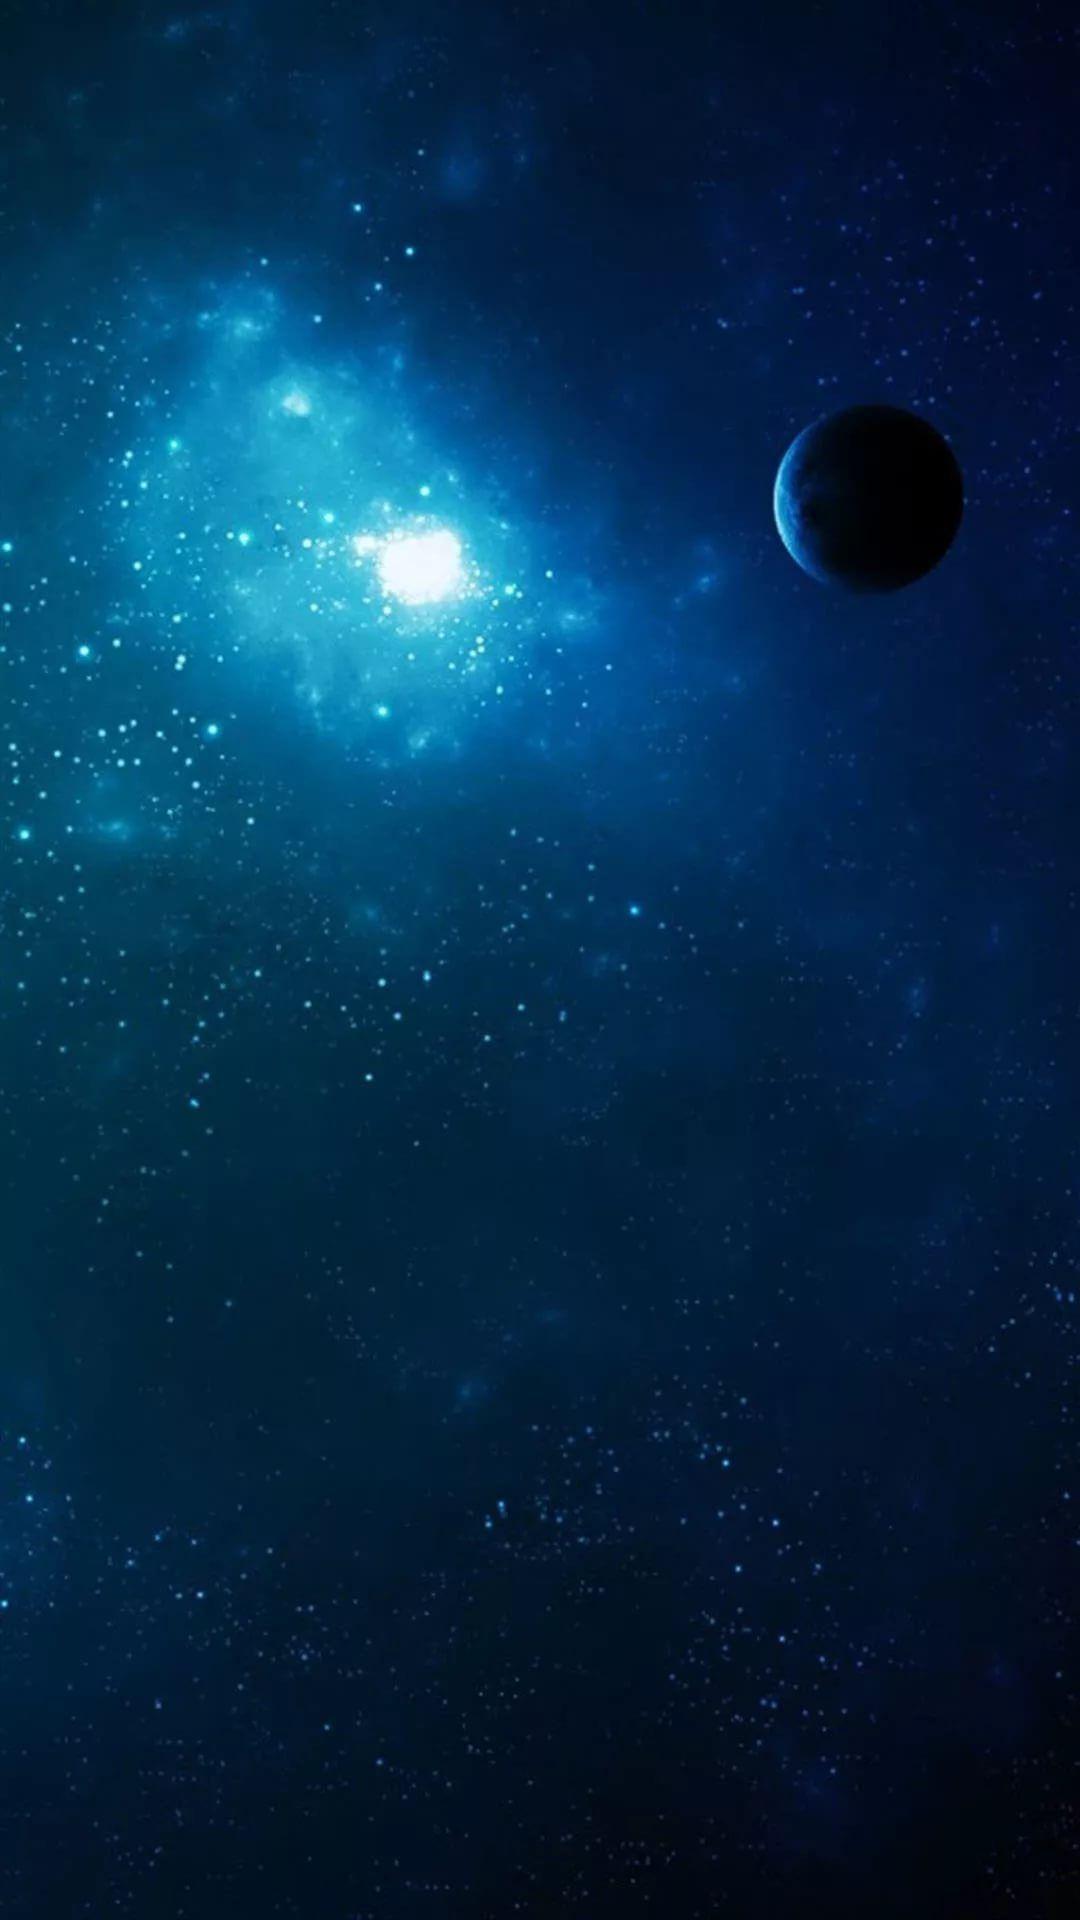 Galagy Tab iOS wallpaper